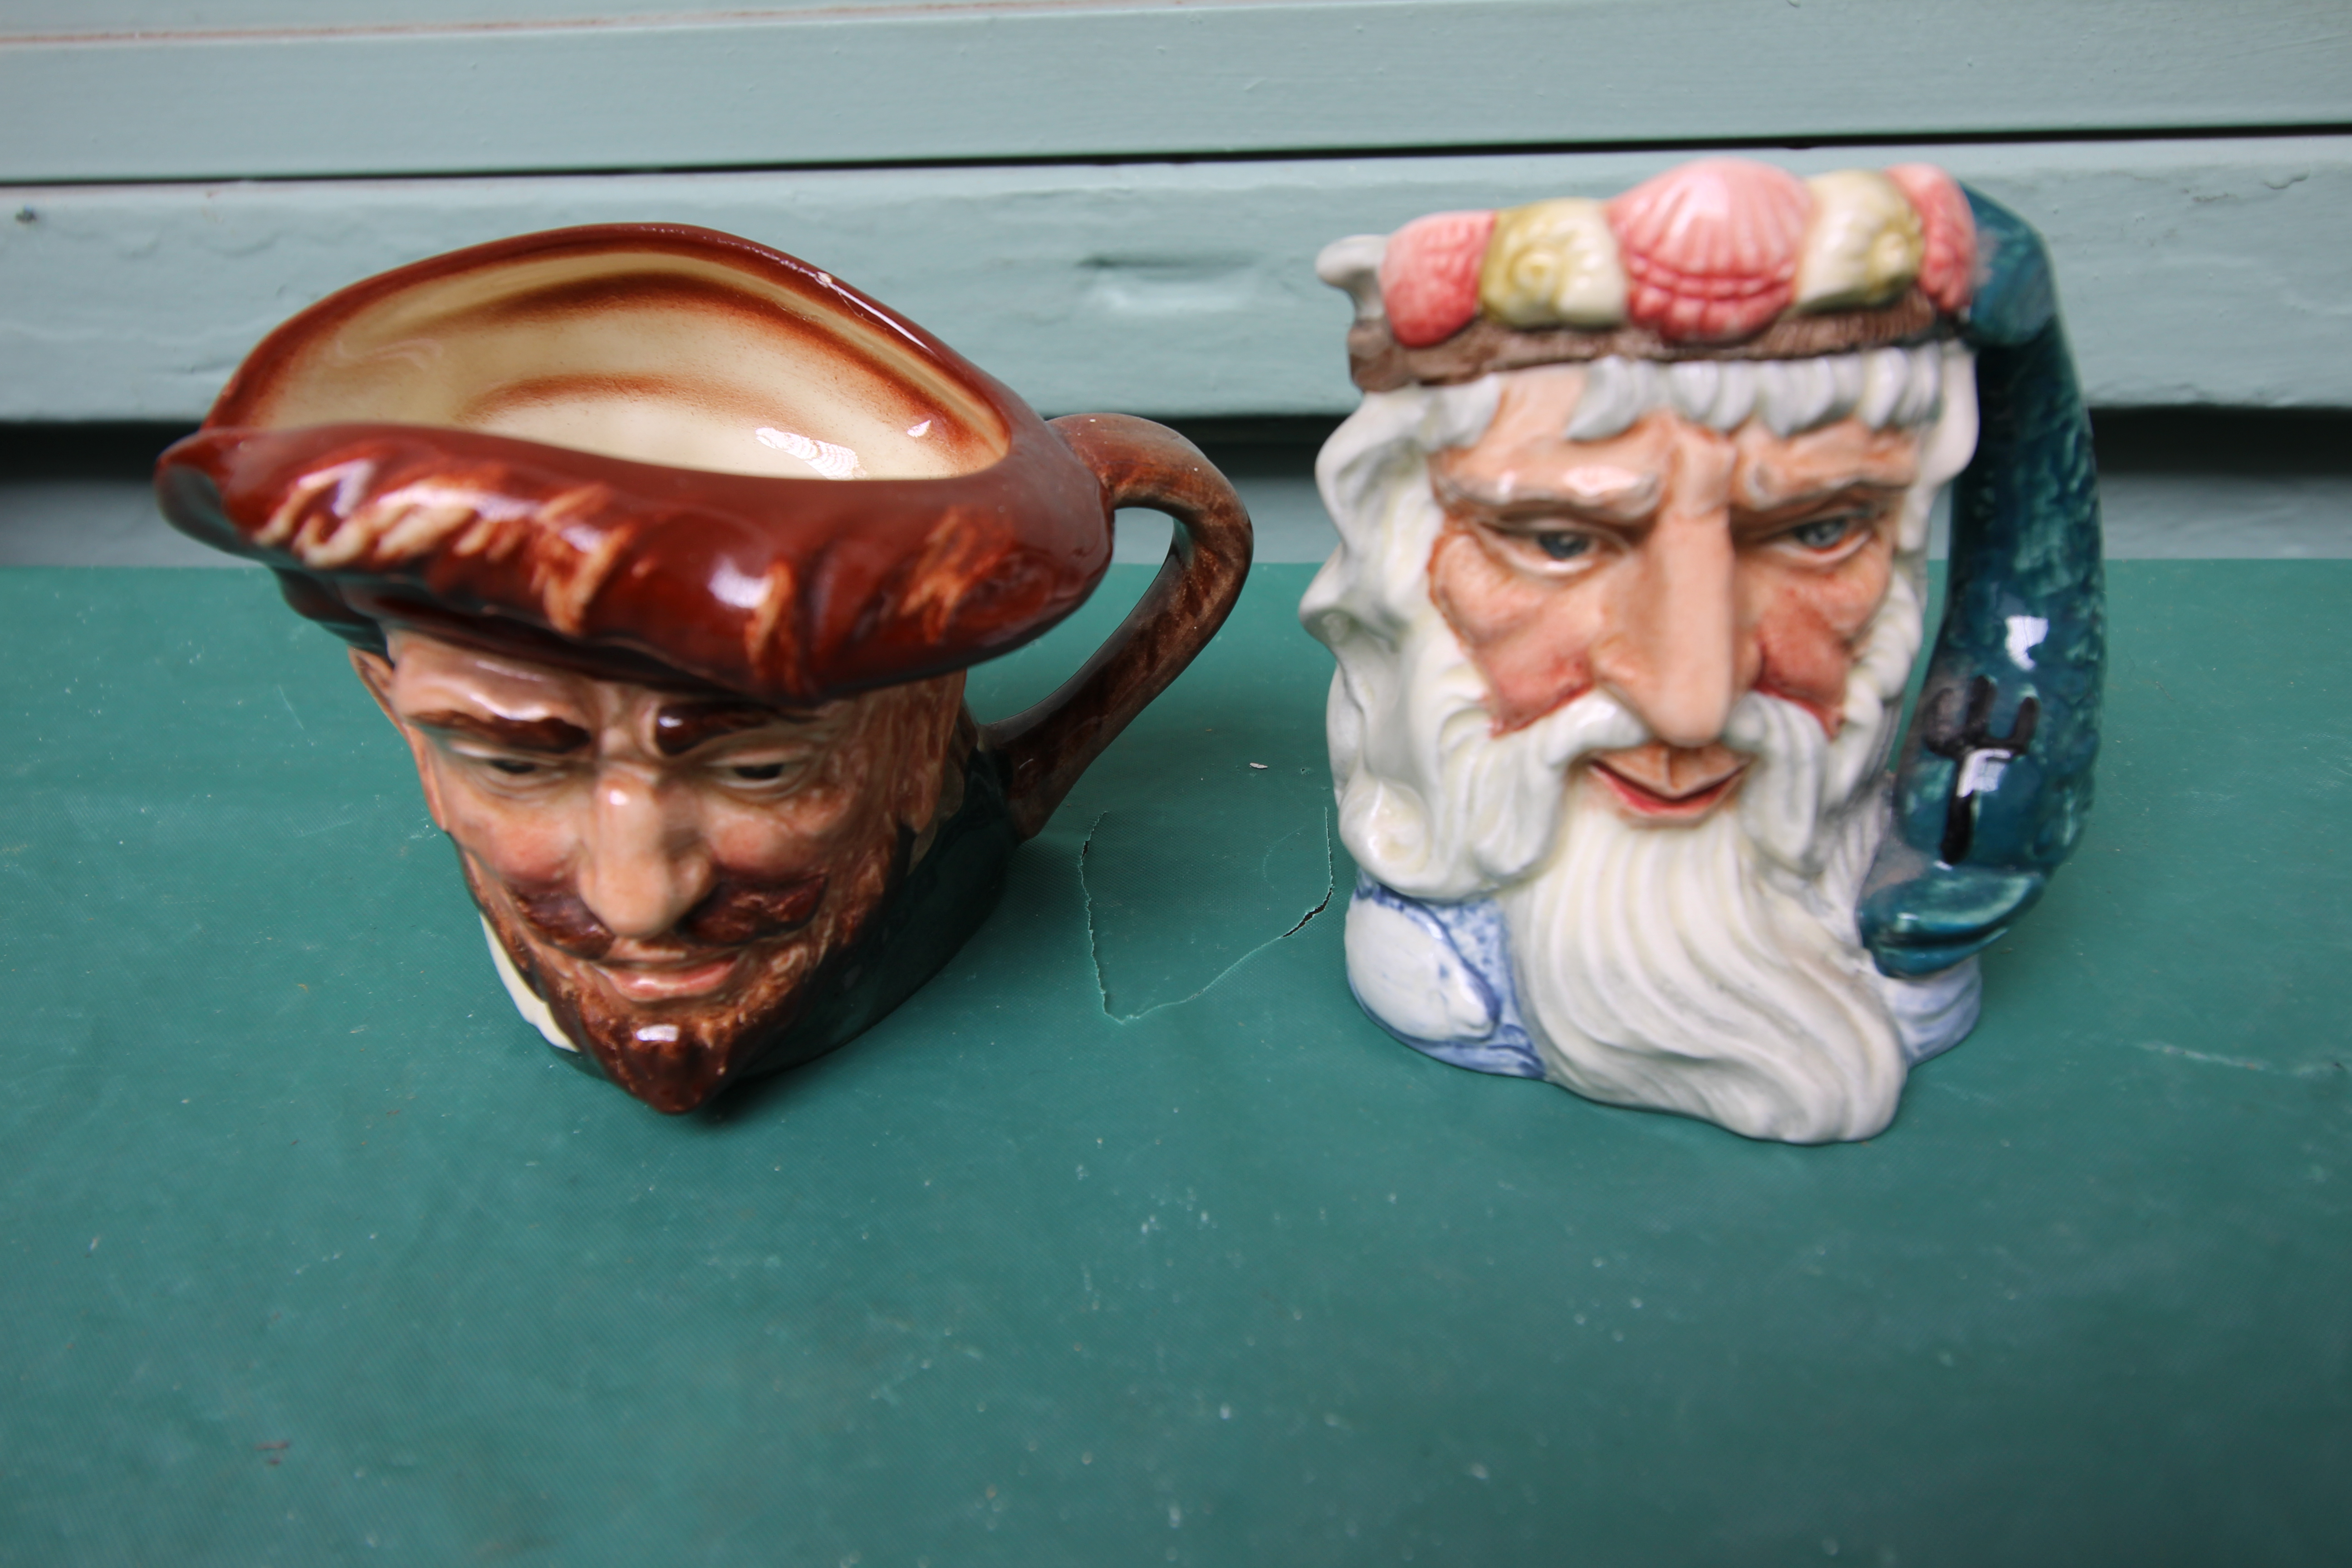 5 miniature Royal Doulton character jugs incl. Gone away, Sairey Gamp, Neptune etc. - Image 2 of 4